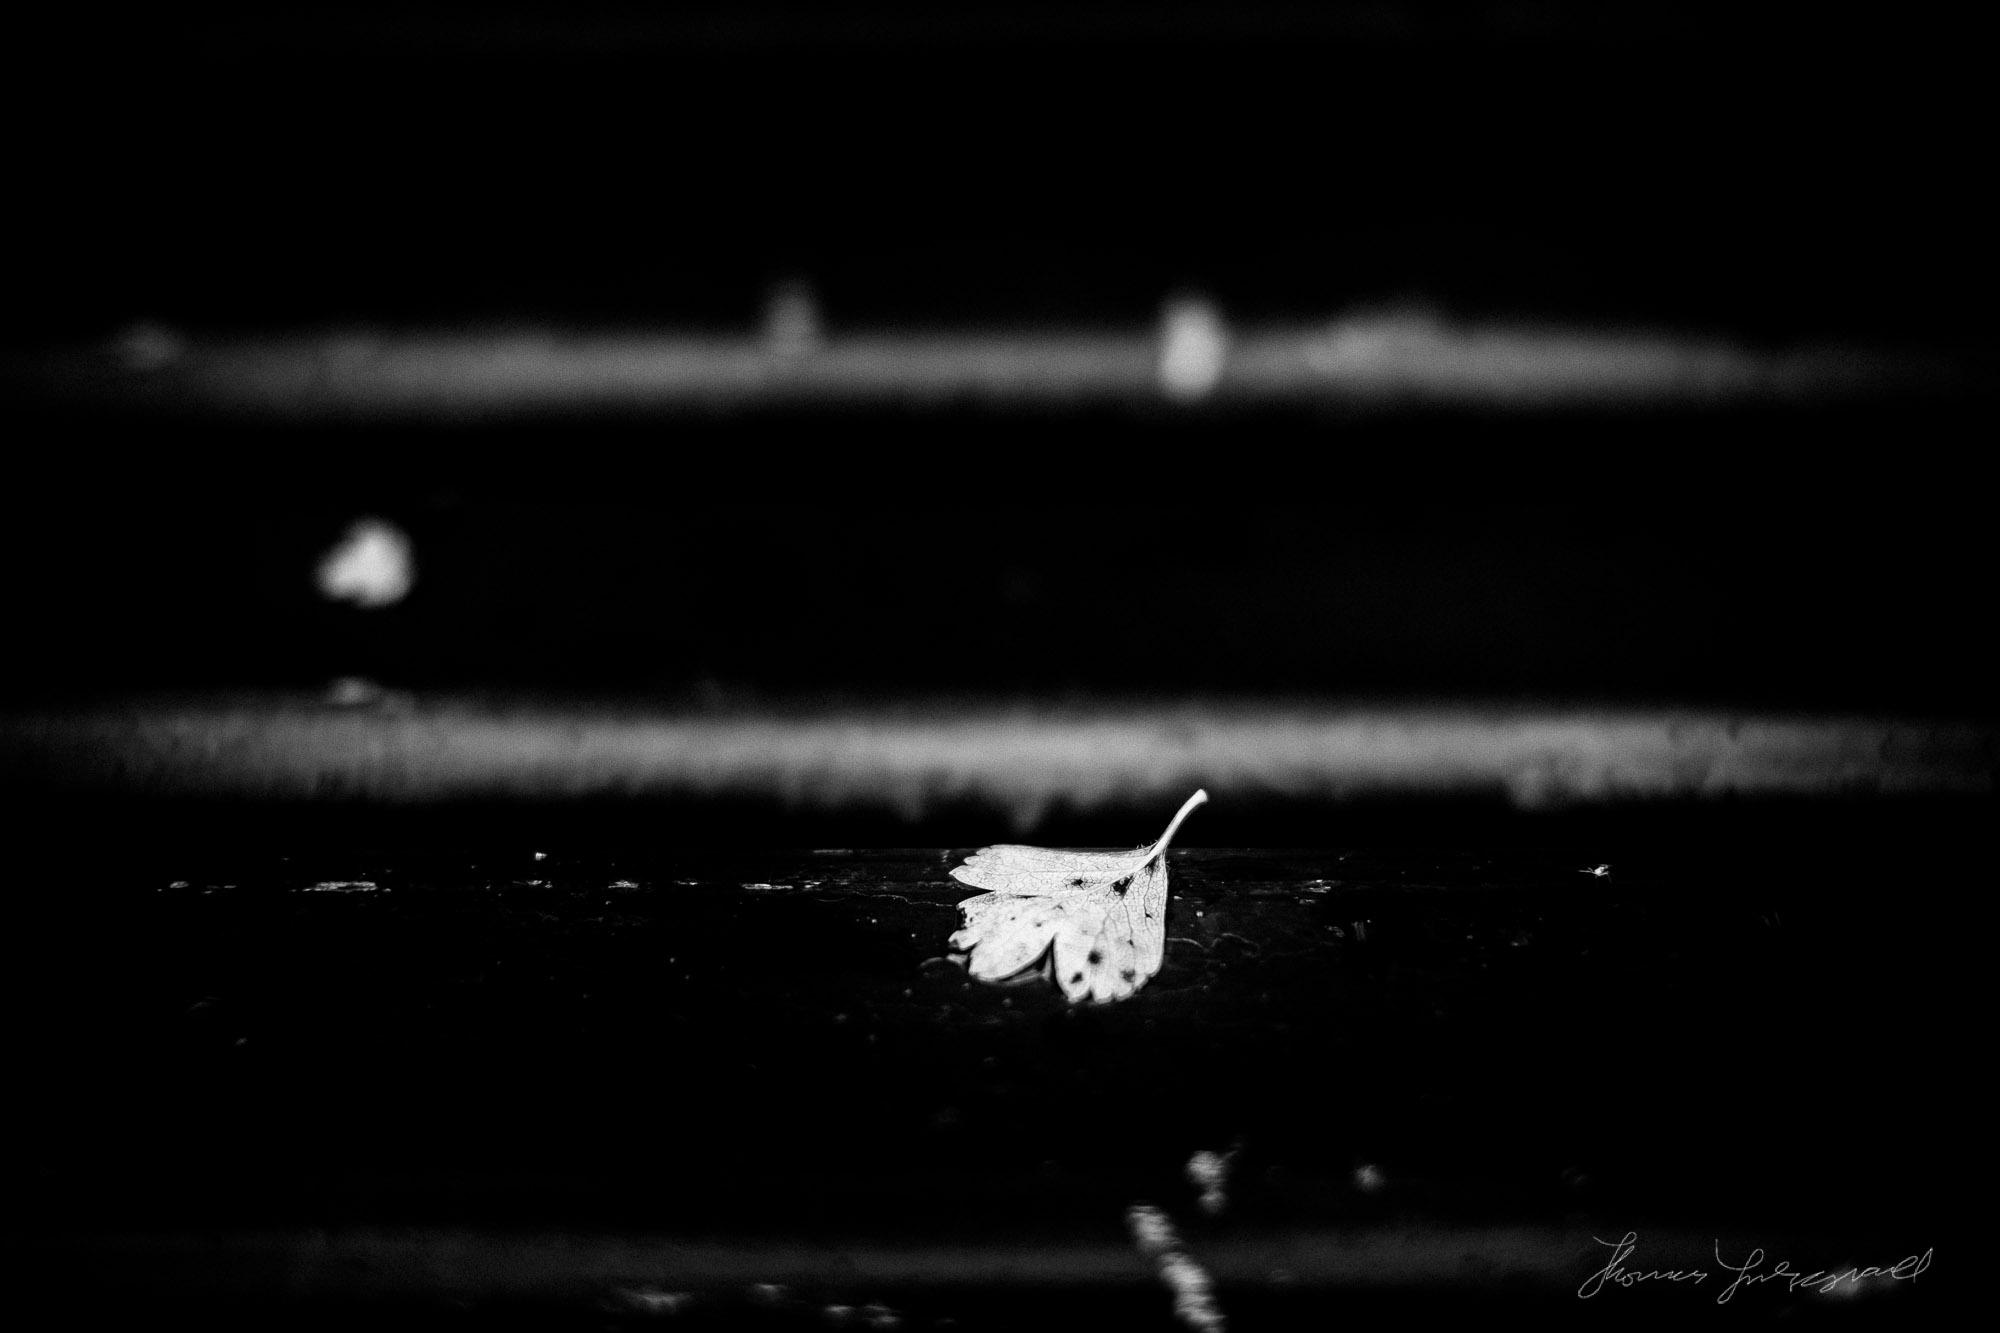 A lone leaf on a bench